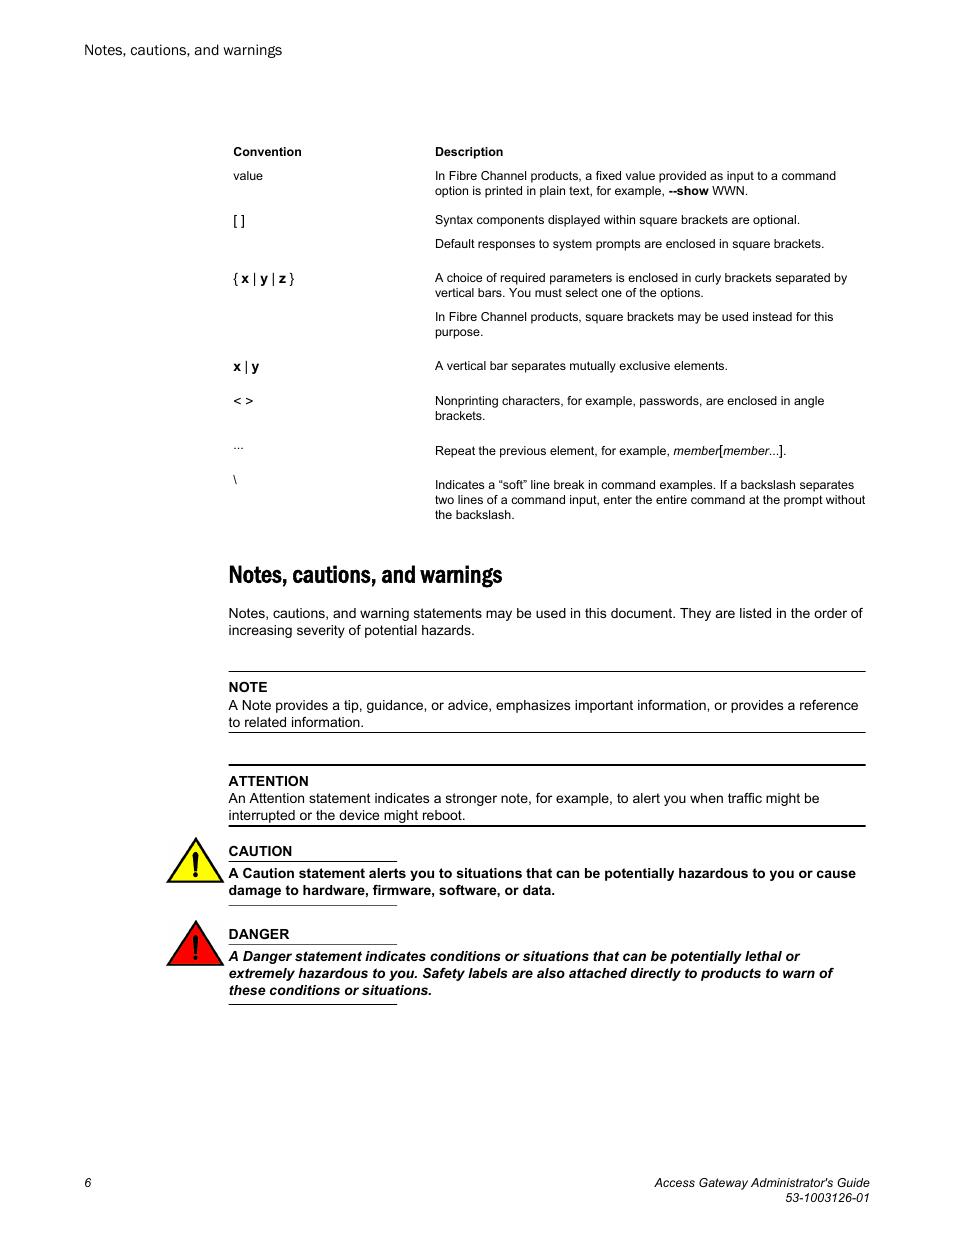 notes cautions and warnings brocade access gateway rh manualsdir com Va Code 8.01 380 Virginia Code 8.01 428